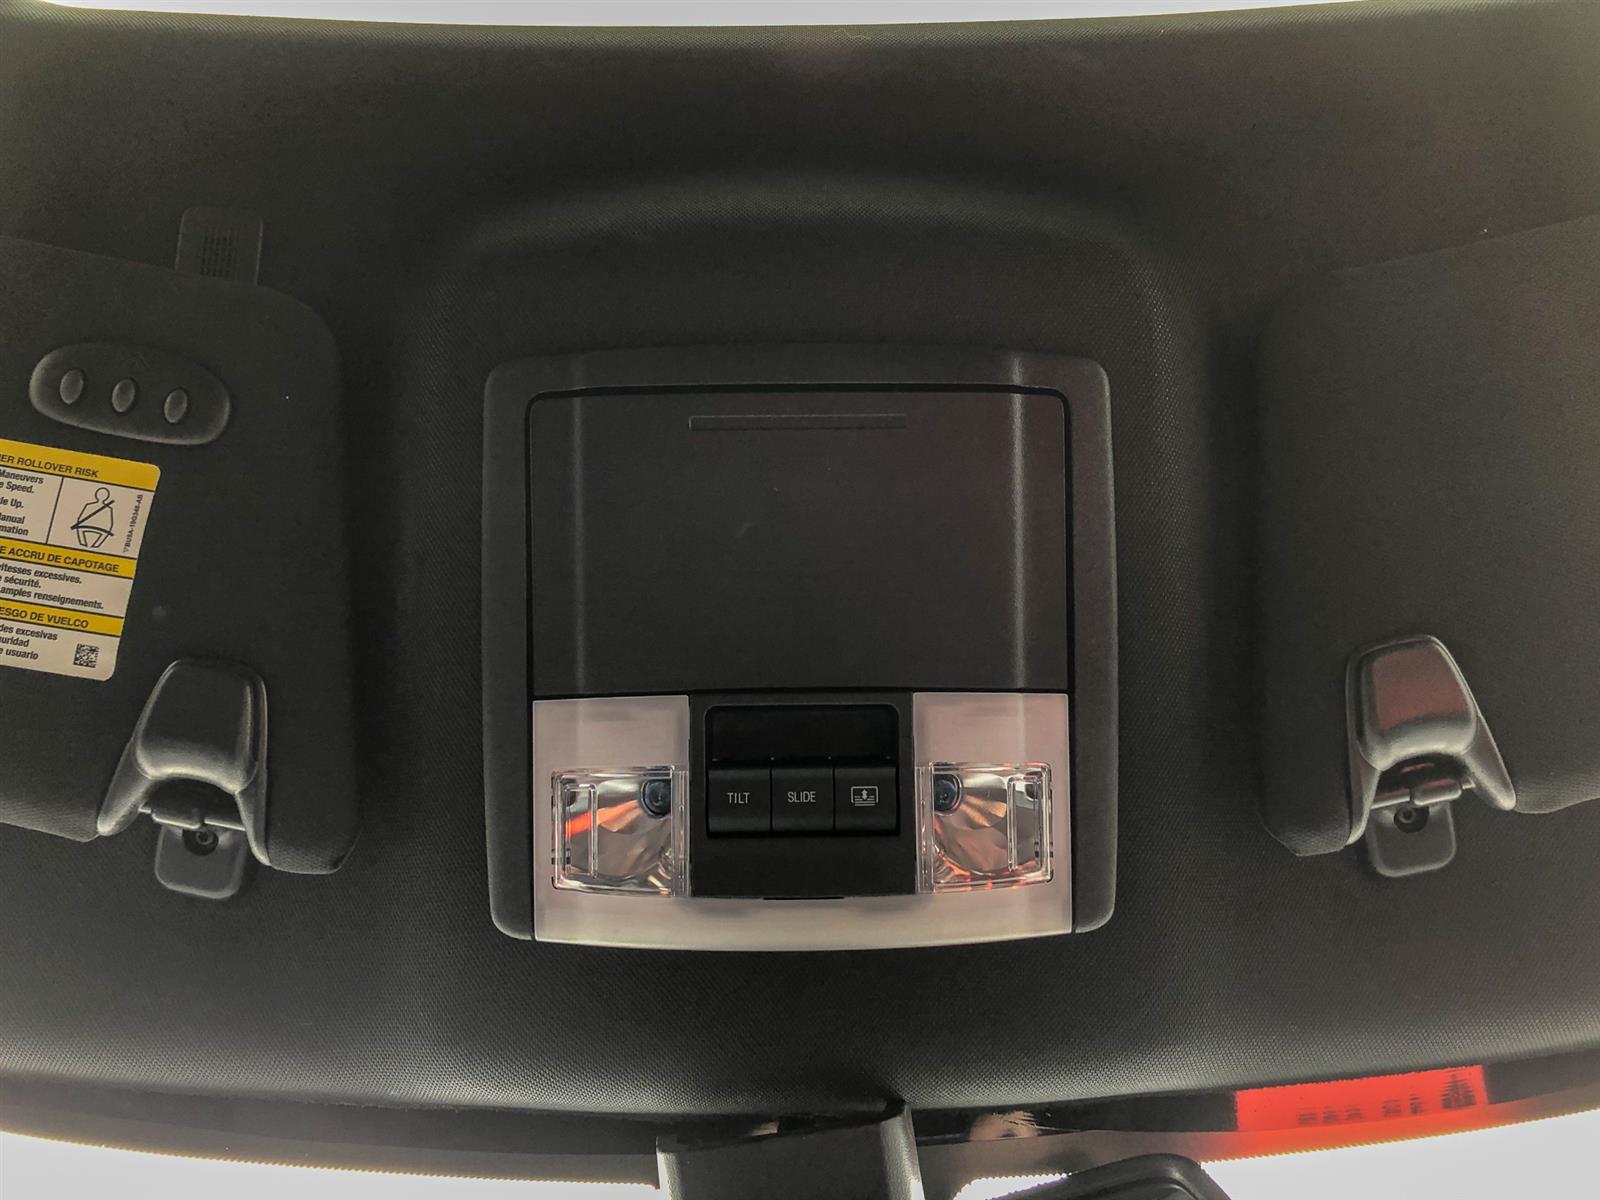 2019 Ford Explorer SPORT | 3.5L V6 ECOBOOST | 4WD | LANE-KEEP | POWERED/HEATED/COOL